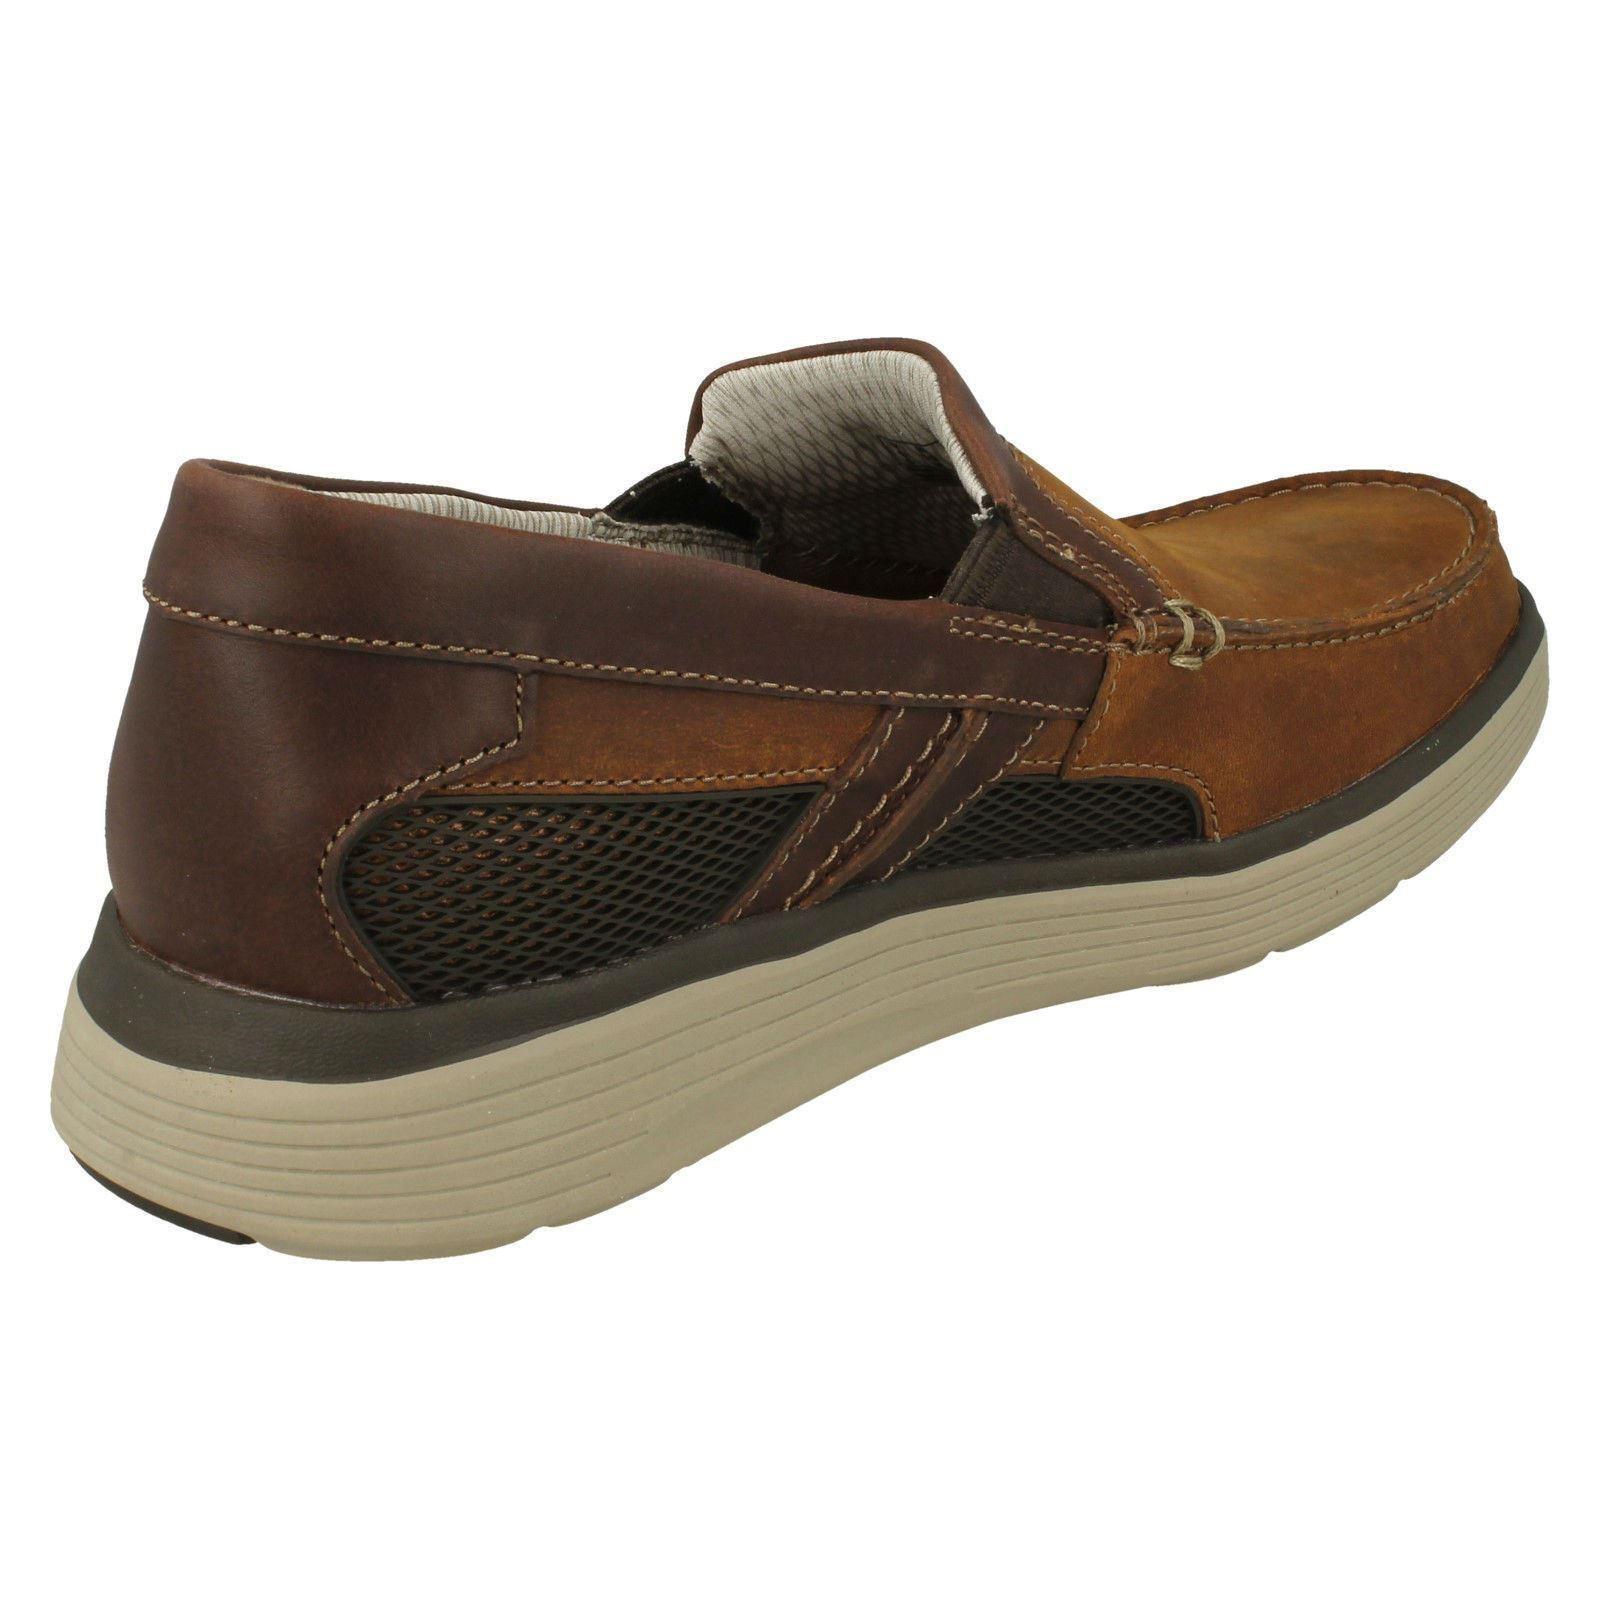 On Herren Clarks Casual Slip On  Schuhes Un Abode Free a30f63